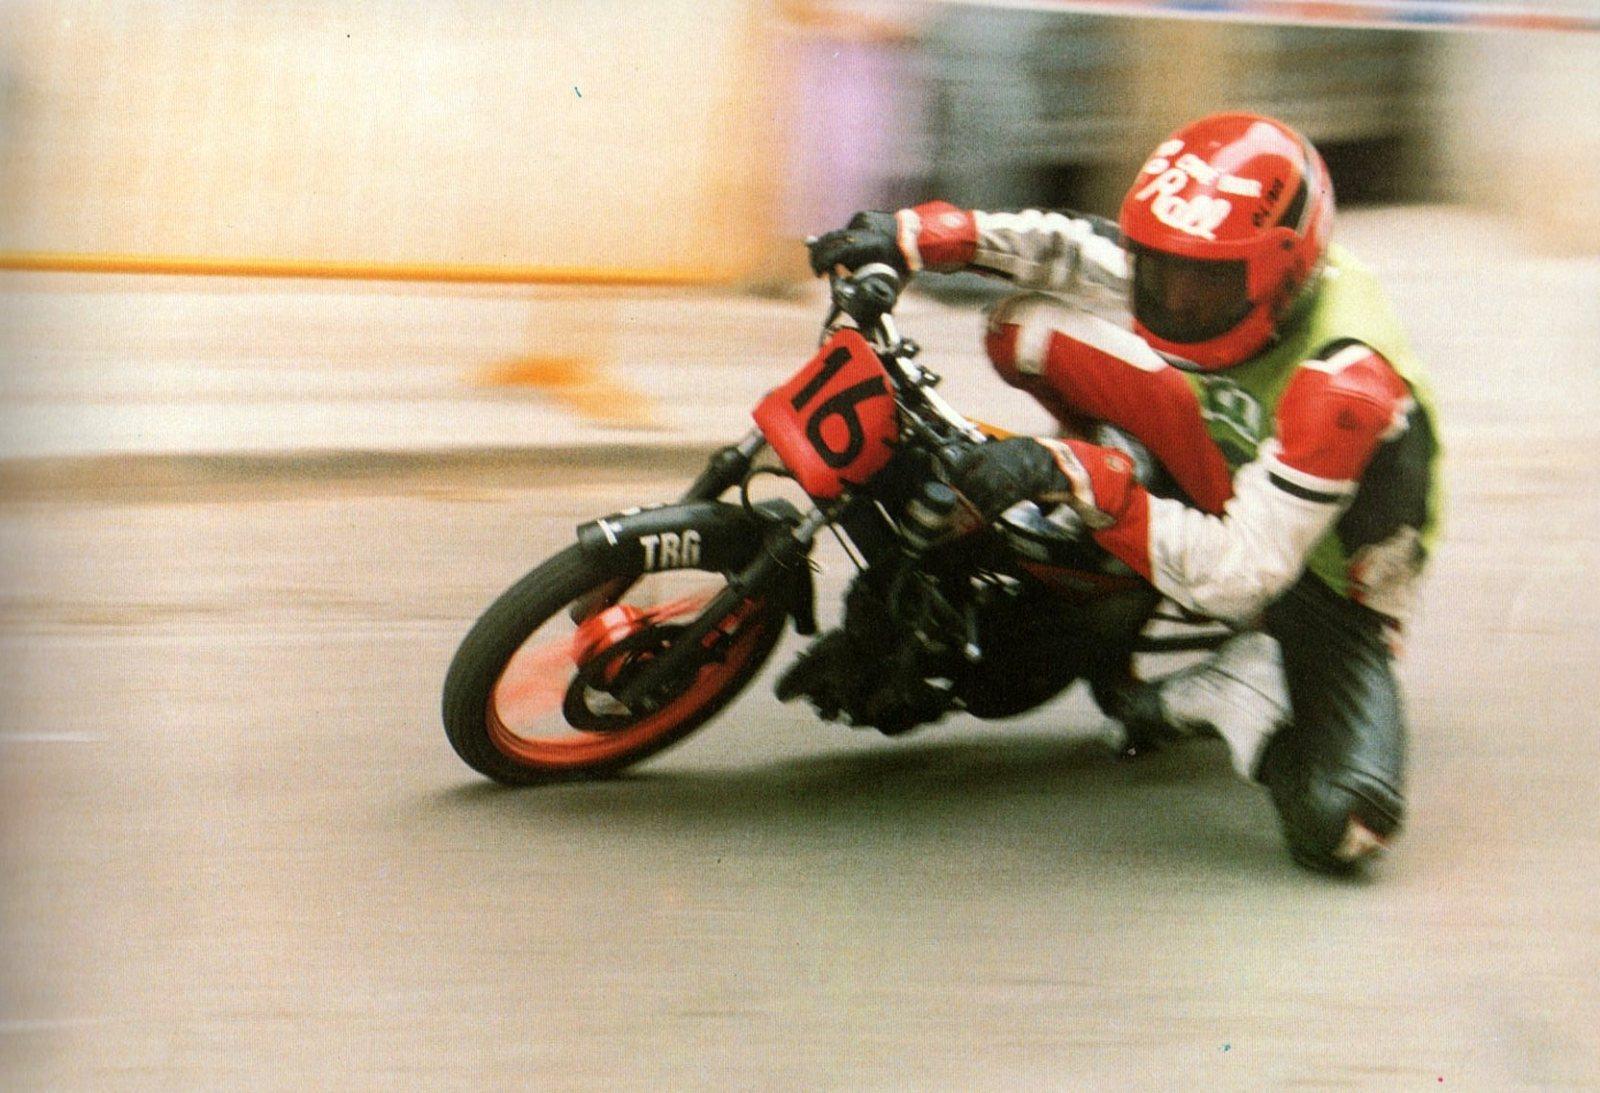 Huvo Casal 80 GP Vicente Rocher. - Página 2 350s75k